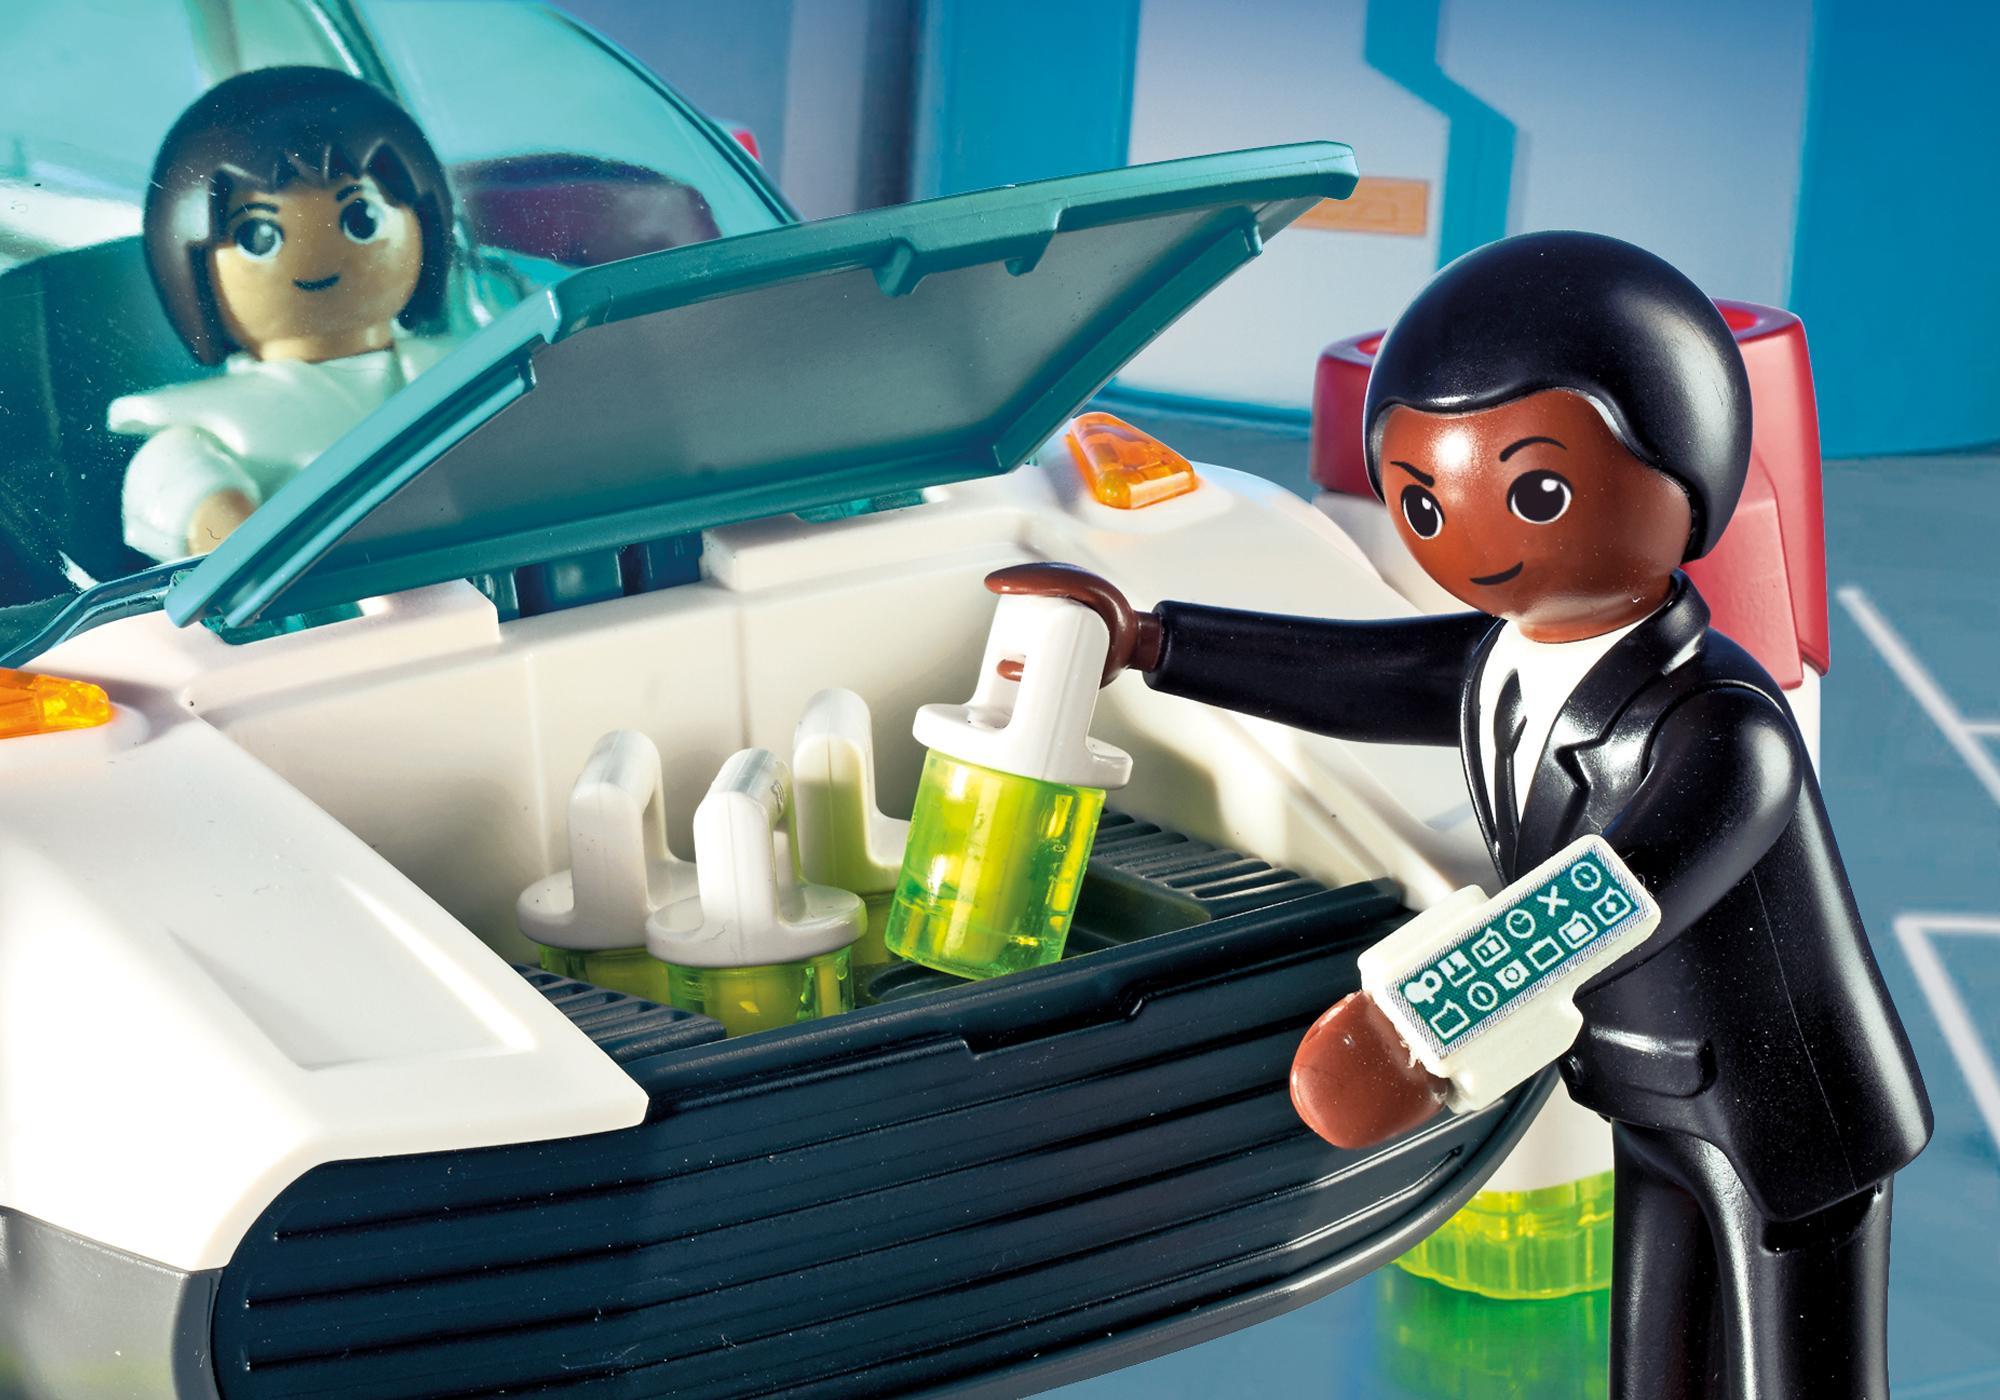 http://media.playmobil.com/i/playmobil/9002_product_extra1/FulguriX mit Agent Gene